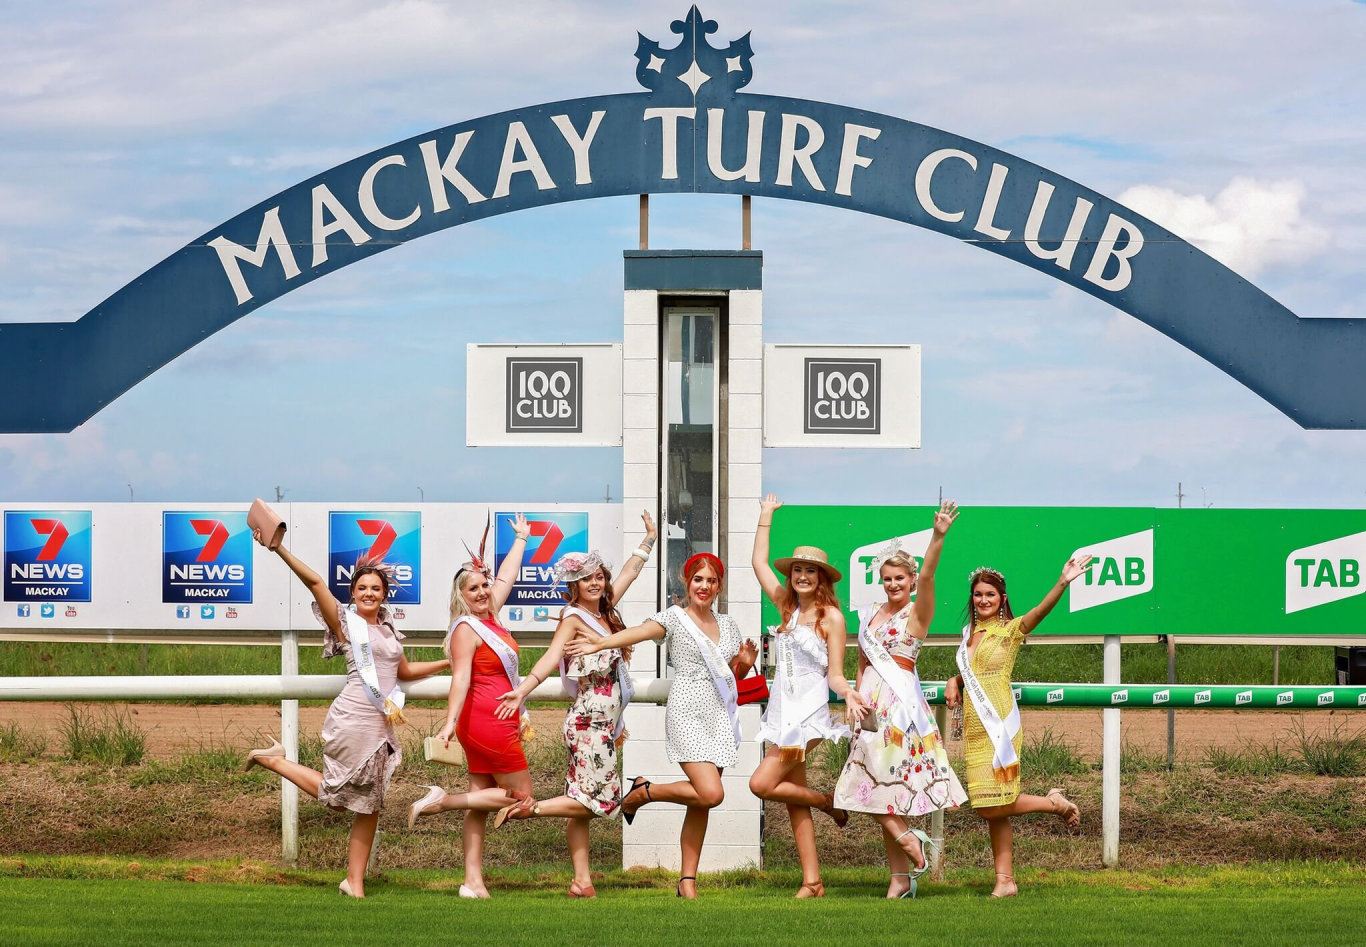 The 2020 Mackay Turf Girl nominees.